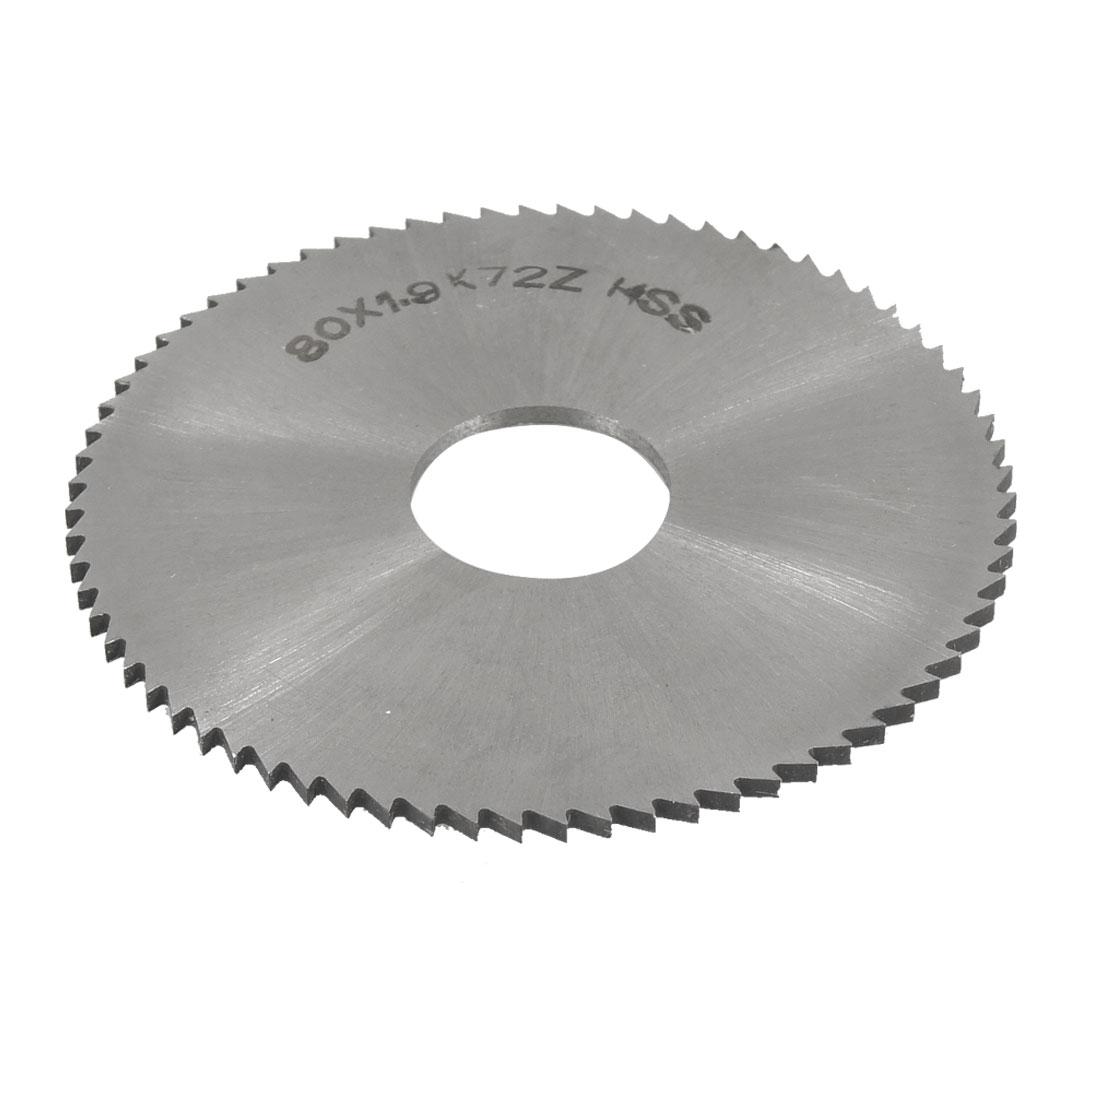 Silver Tone HSS High Speed Steel 72T Slitting Saw Blade 80mm x 1.9mm x 22mm